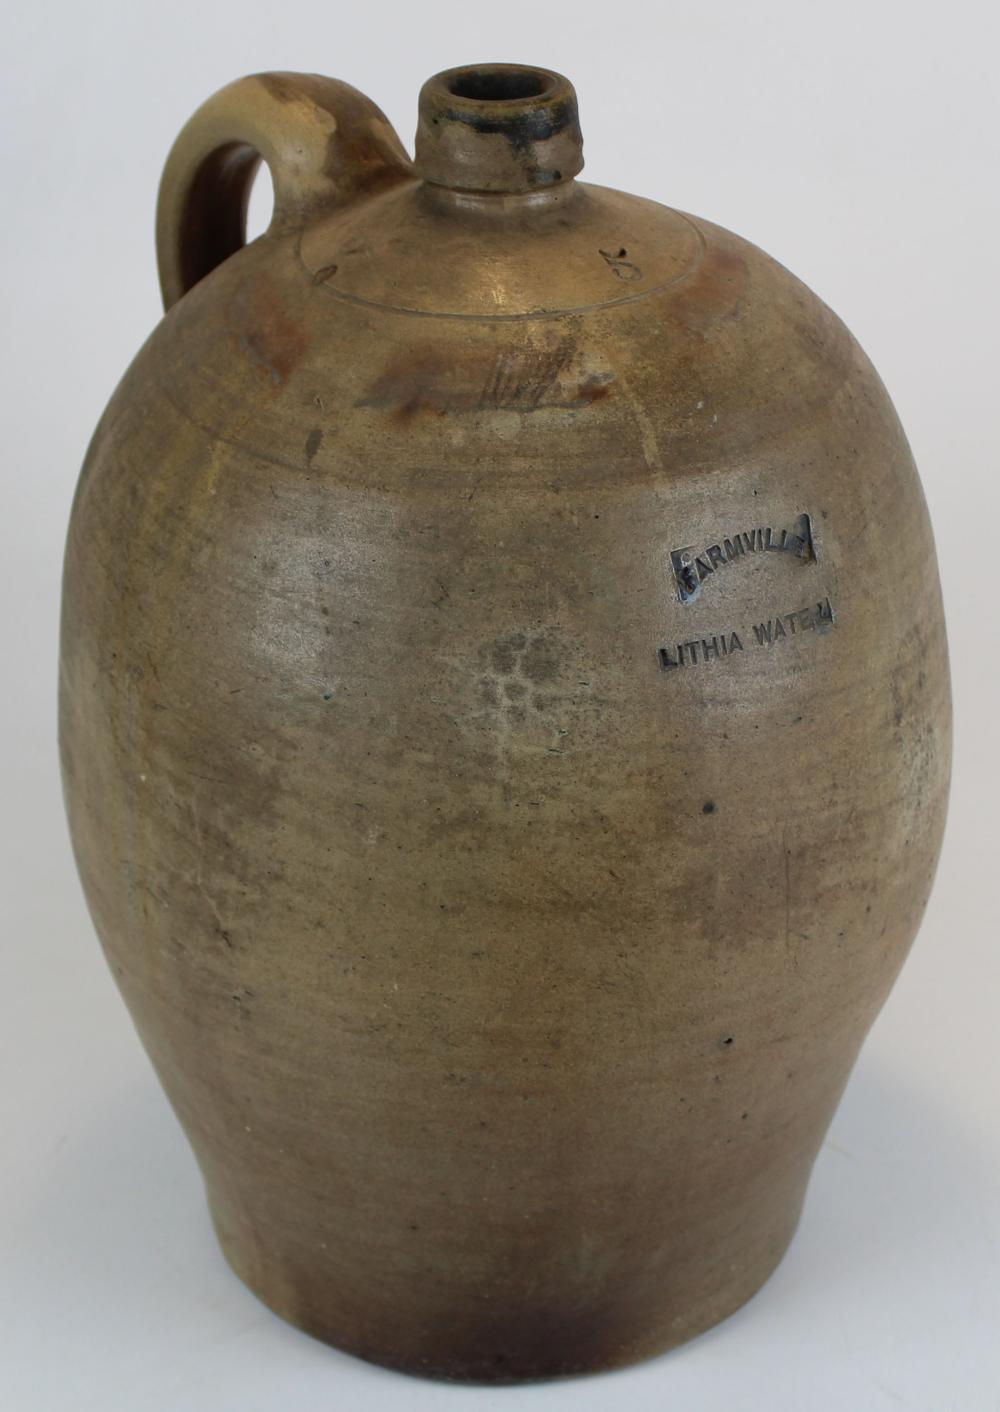 Farmville Lithia Water 5 Gallon Stoneware jug